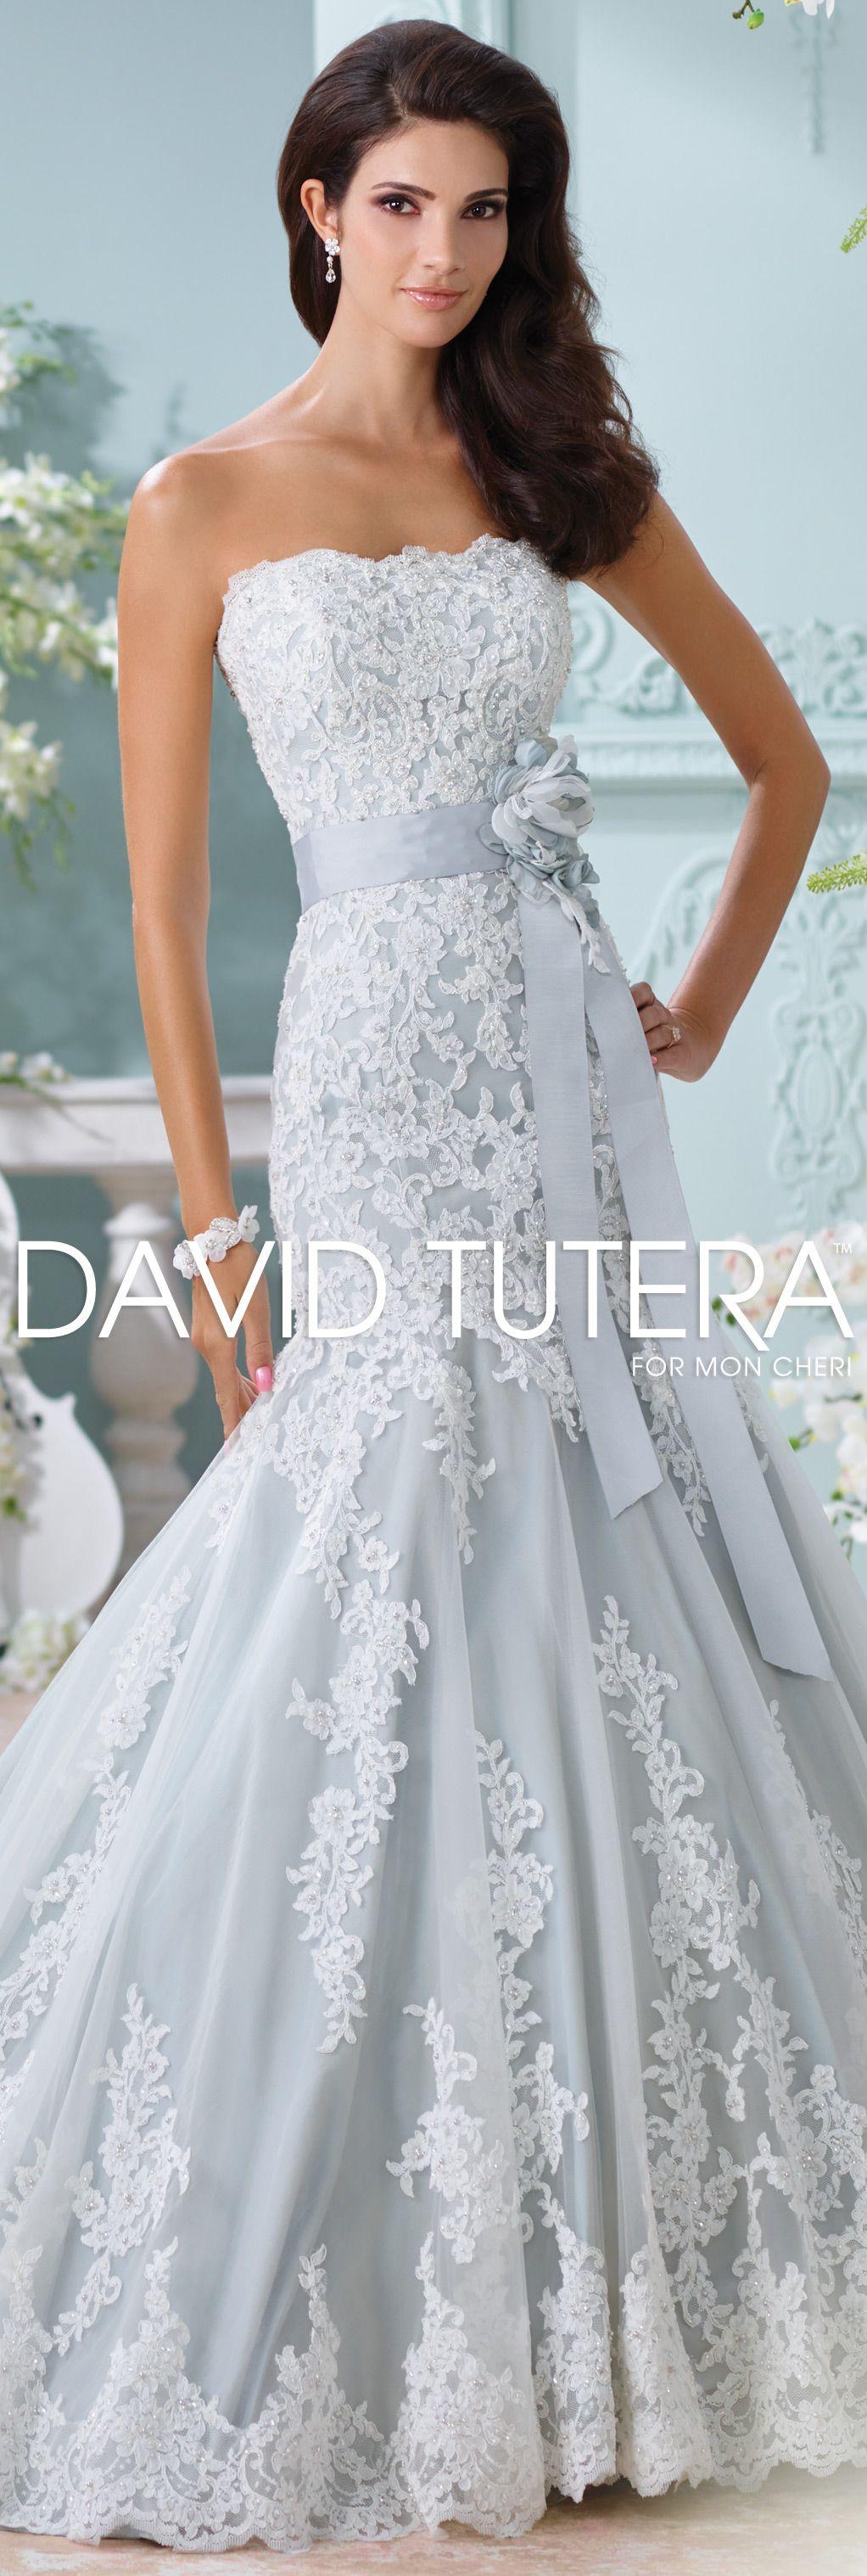 Wedding dresses u spring david tutera gowns and spring